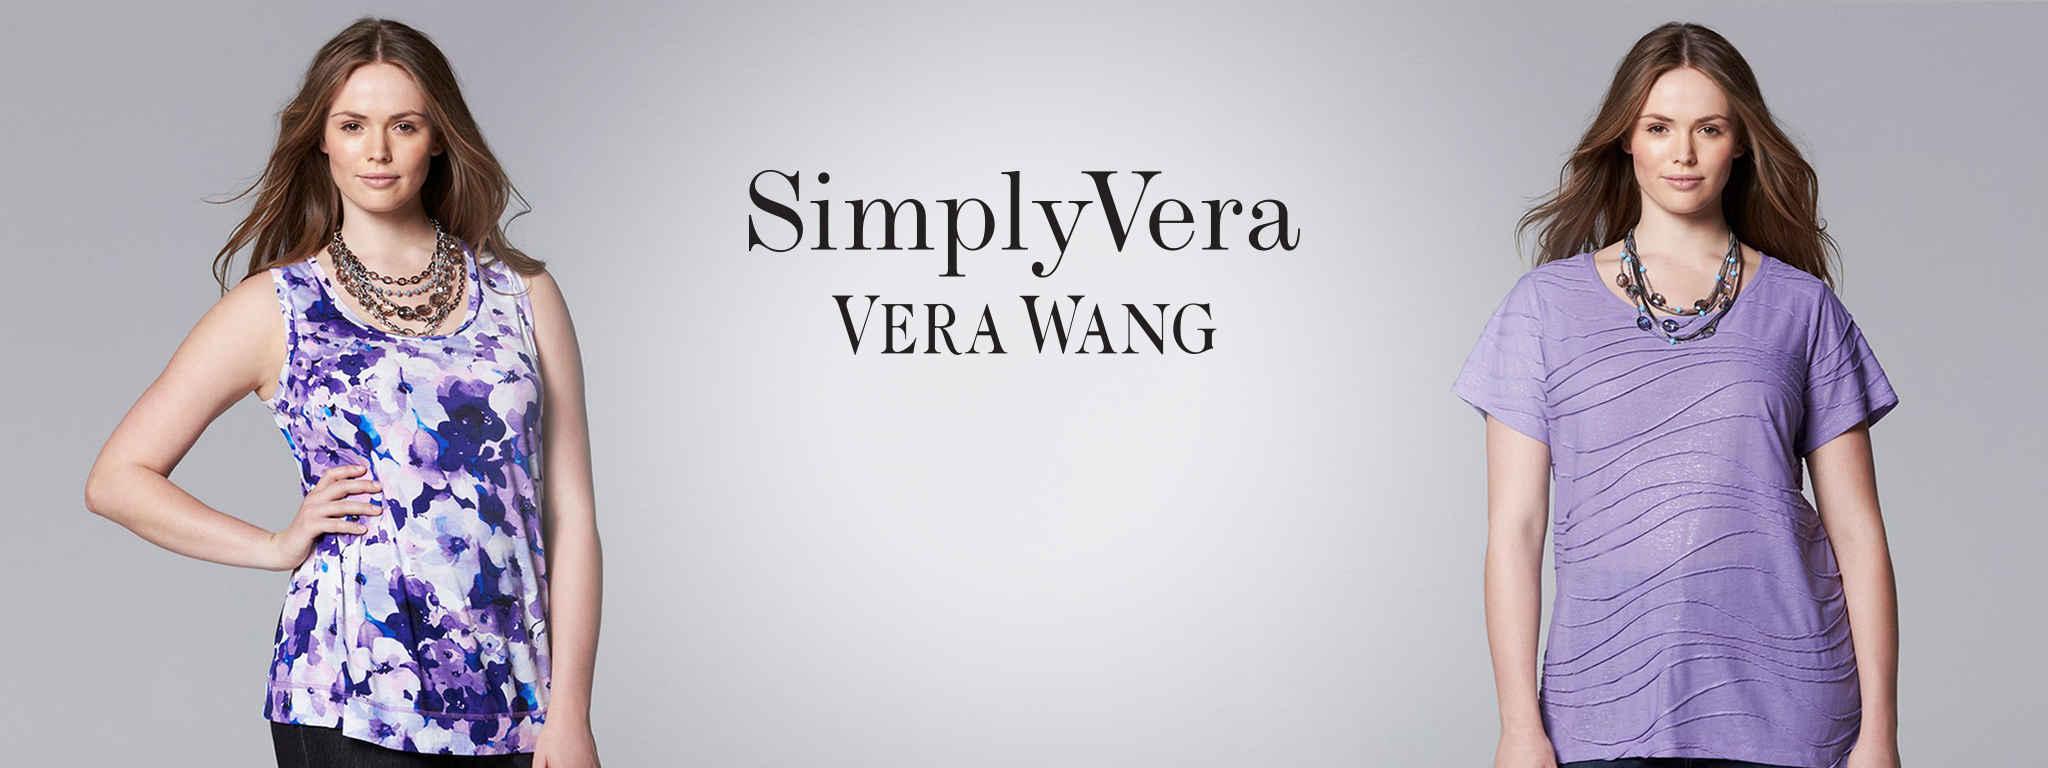 Simply Vera Vera Wang Plus-Size Clothing